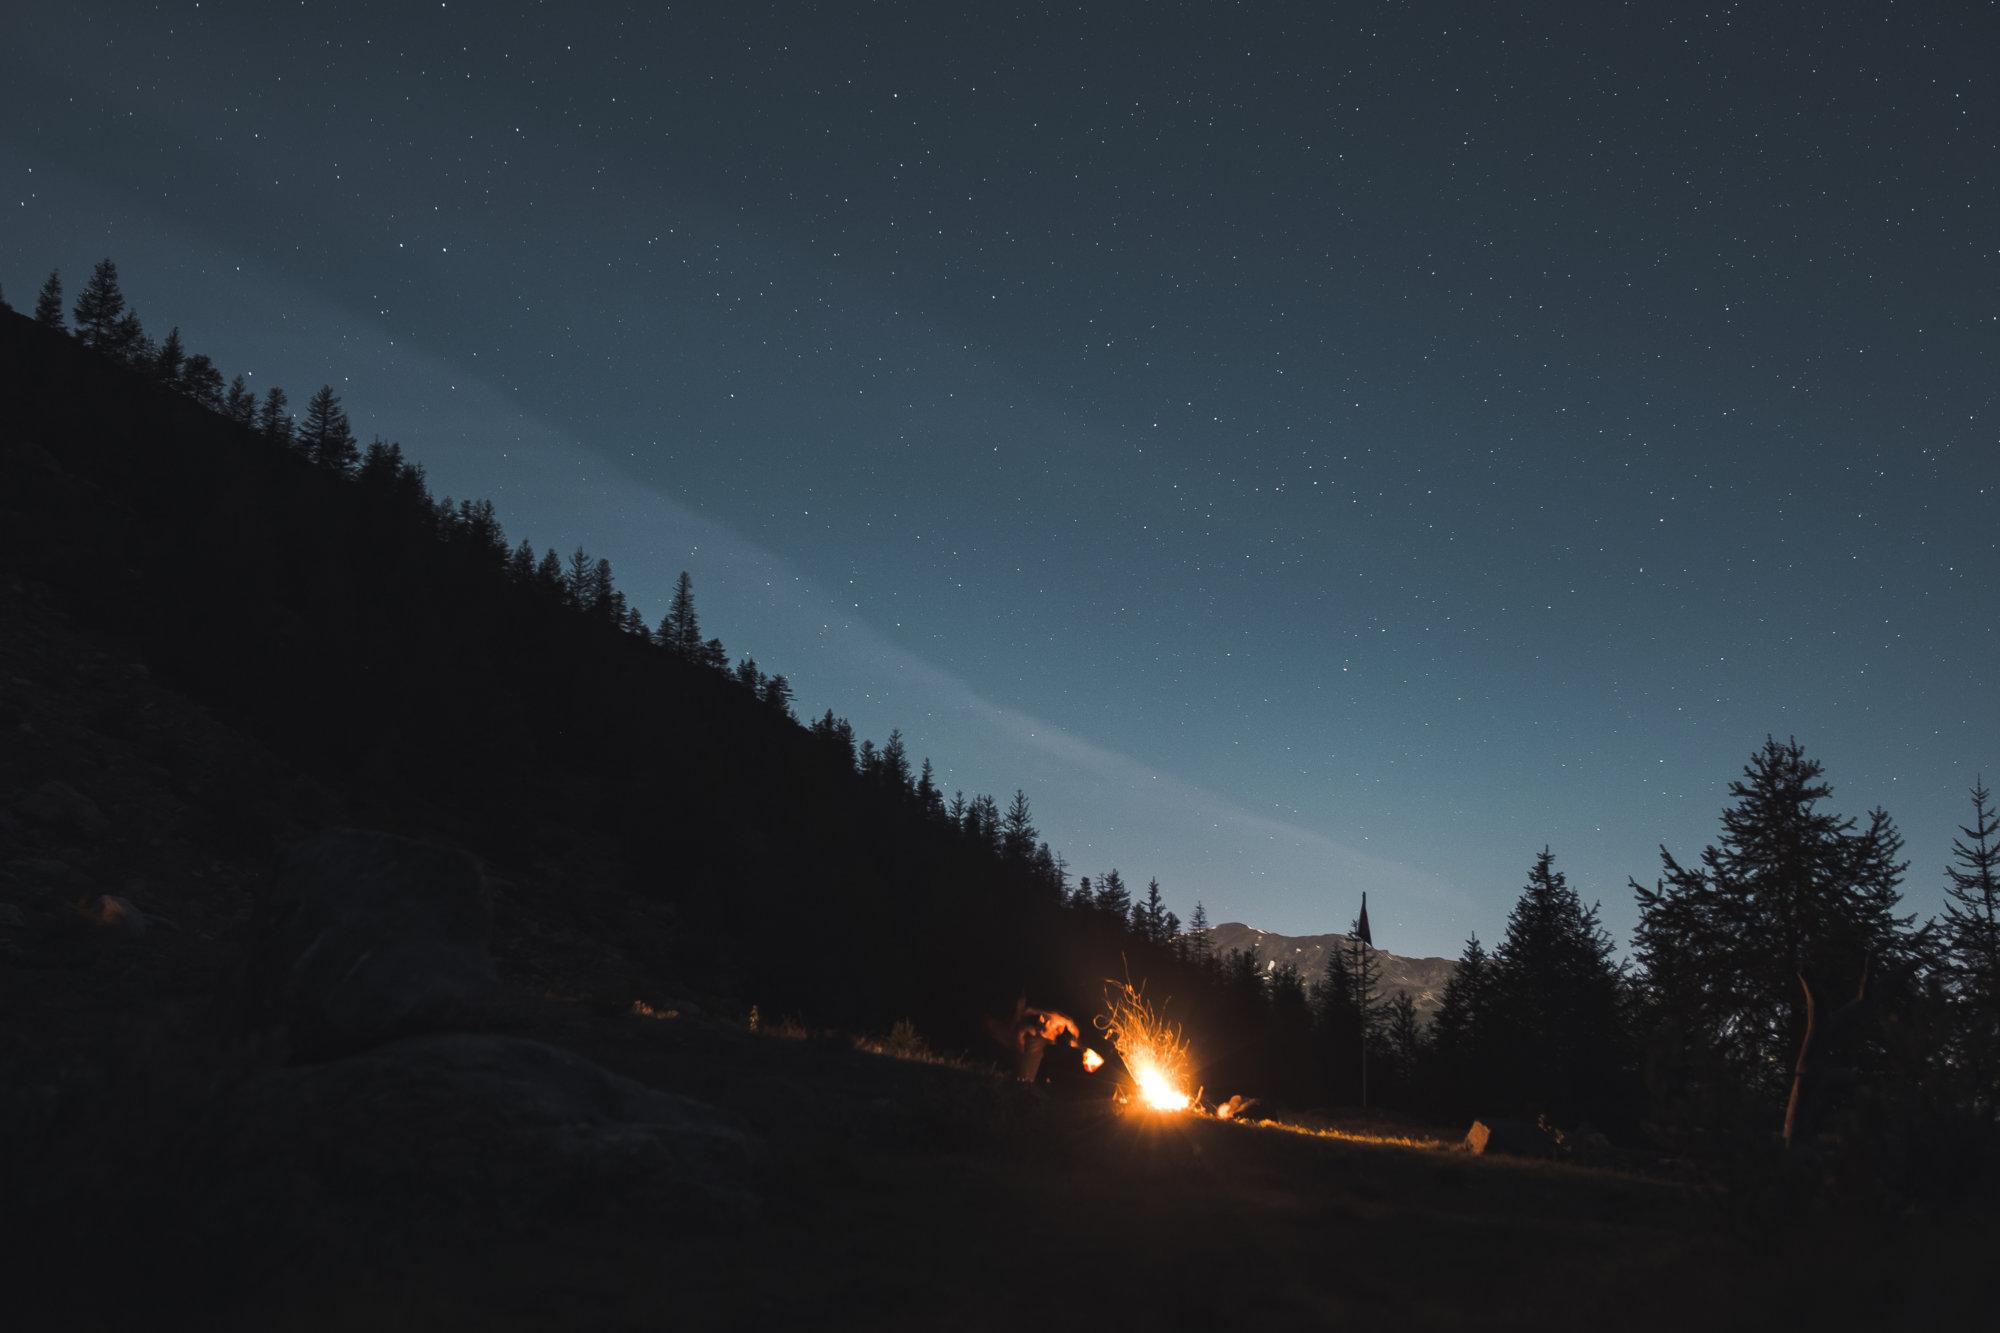 030-kasuma-photografie-photoblog-travelblog-outdoor-camping-2017-gletschertor-alpia-graechen